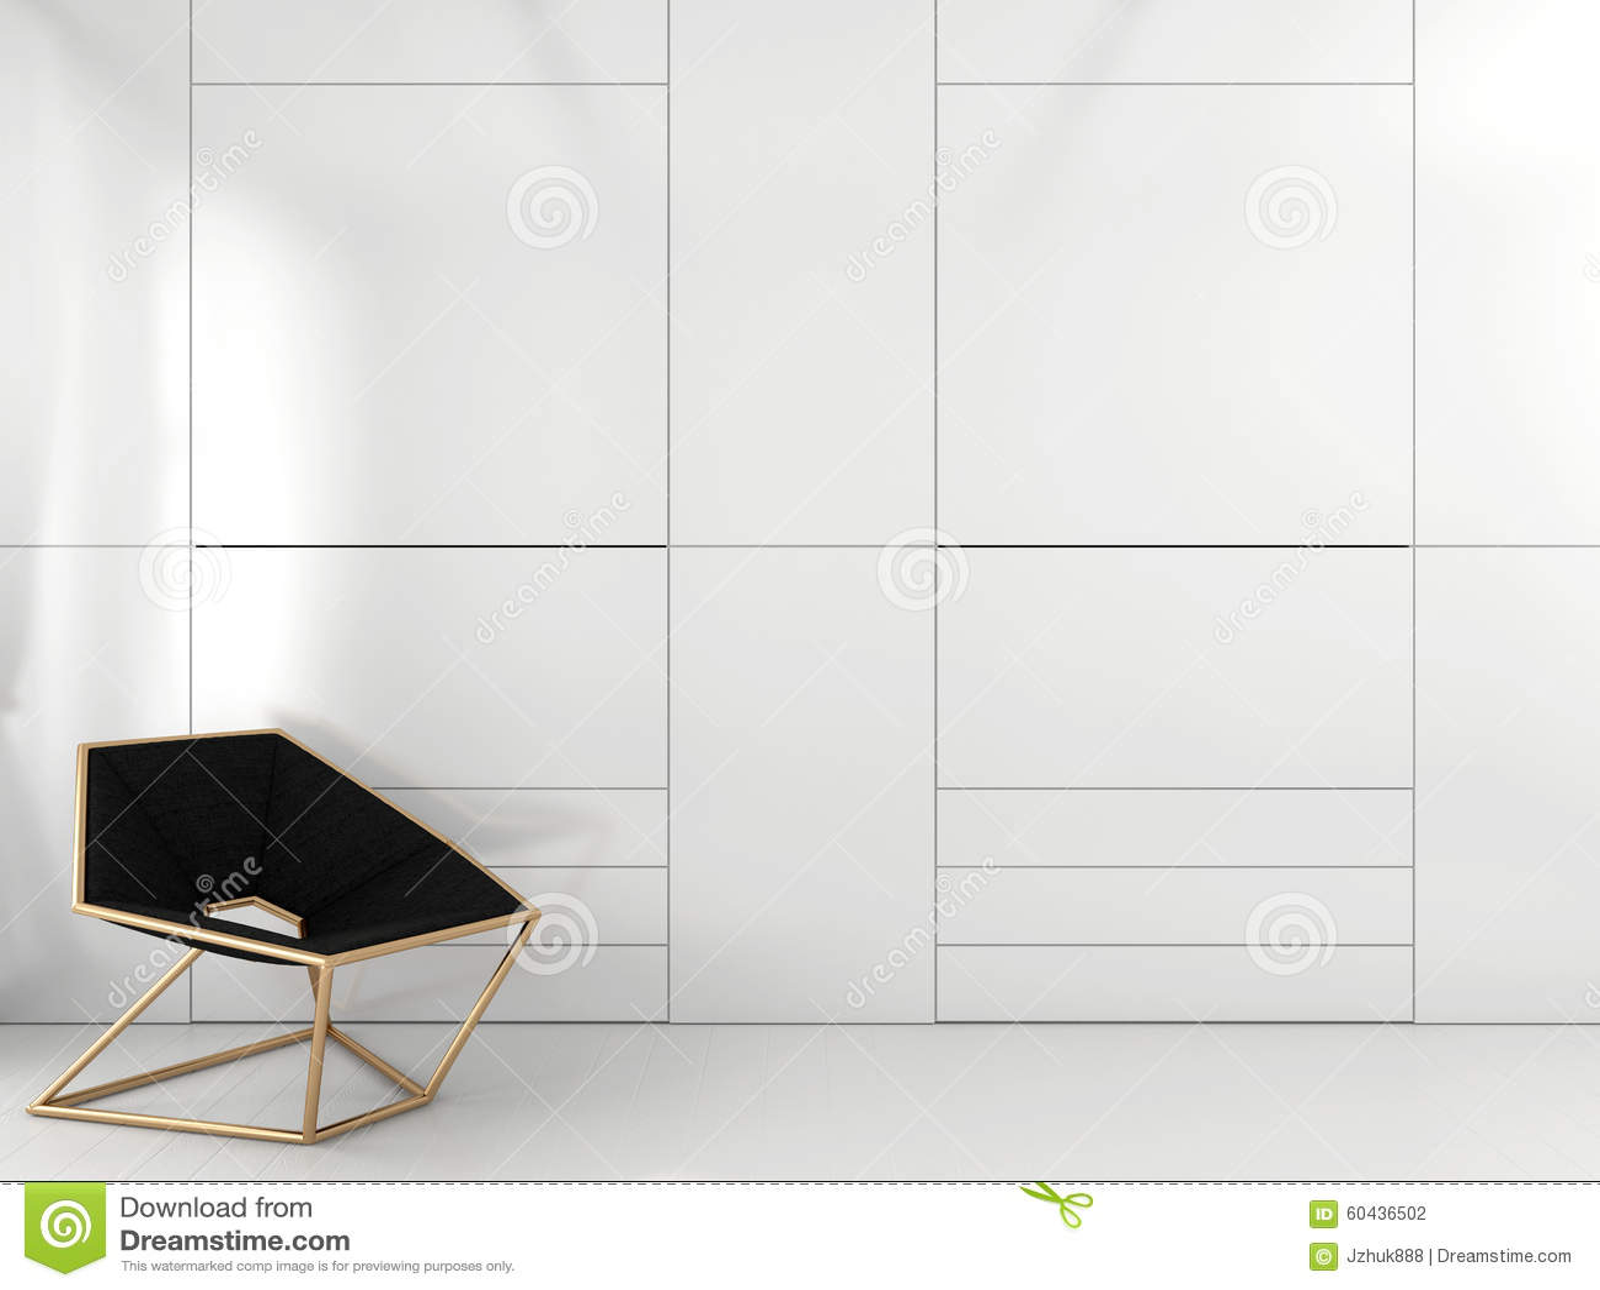 Geometric Black Chair And White Closet